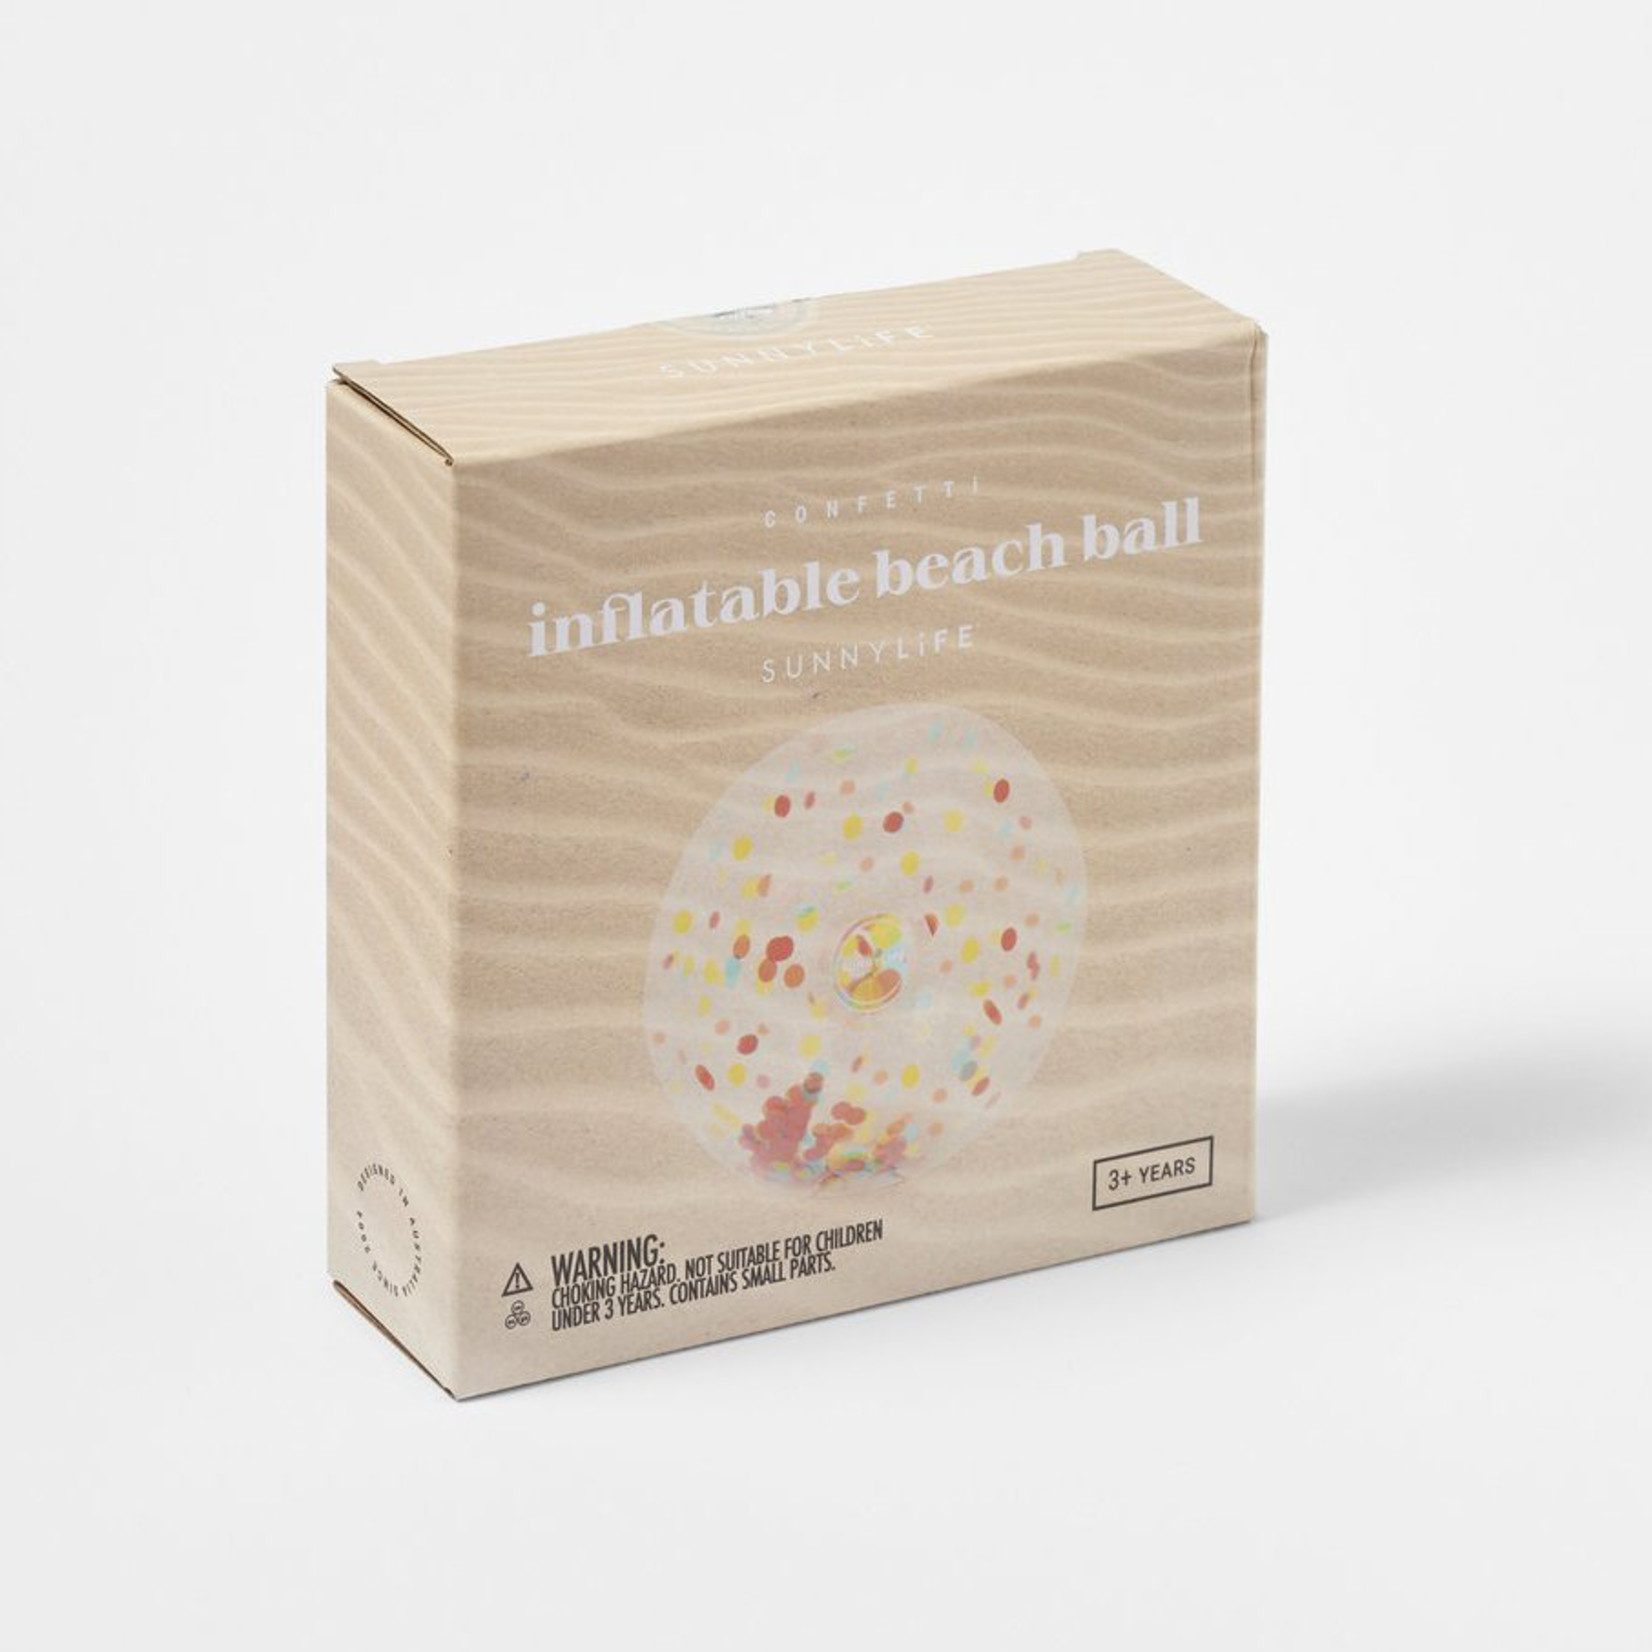 SUNNY LIFE INFLATABLE BEACH BALL CONFETTI